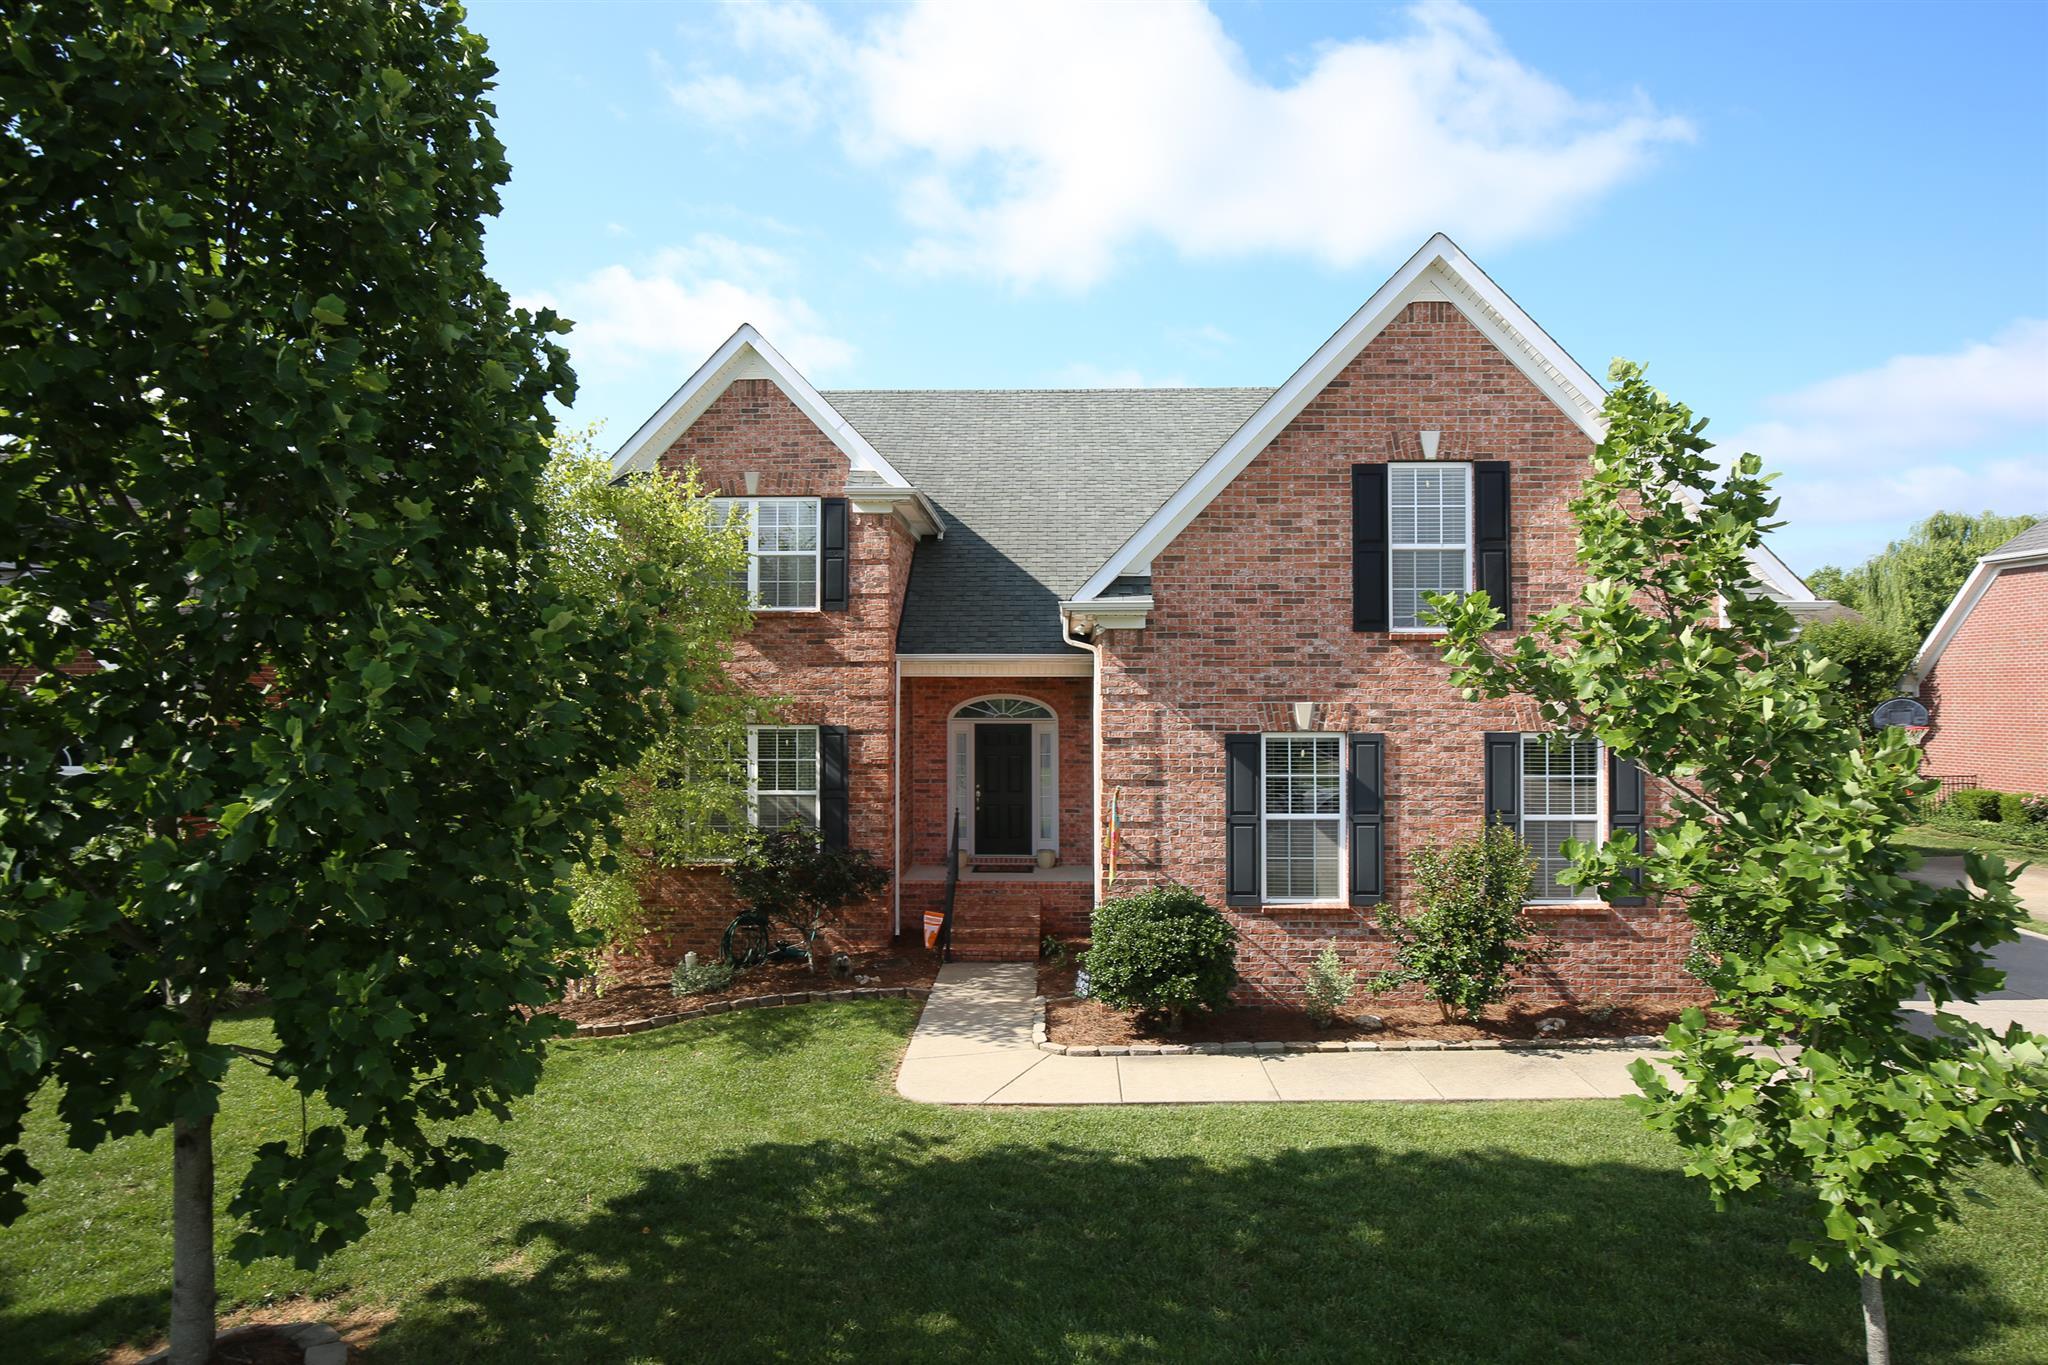 5427 Saint Ives Dr, Murfreesboro, TN 37128